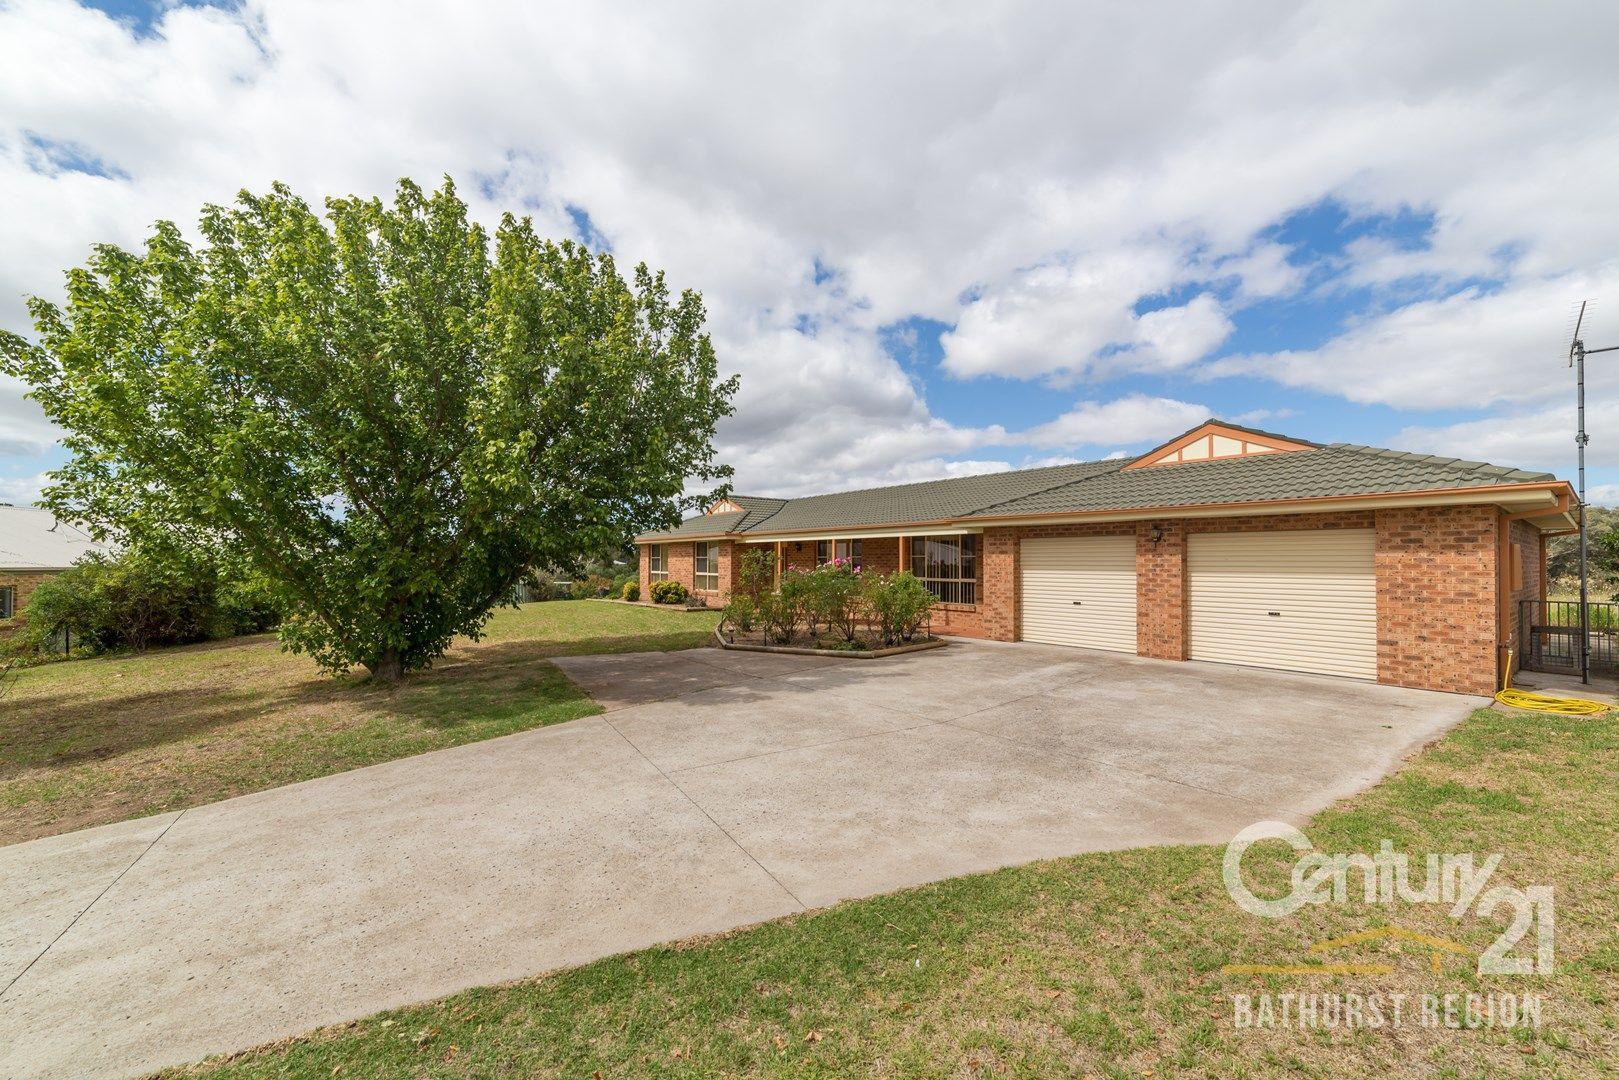 8 Kensington Place, Perthville NSW 2795, Image 0